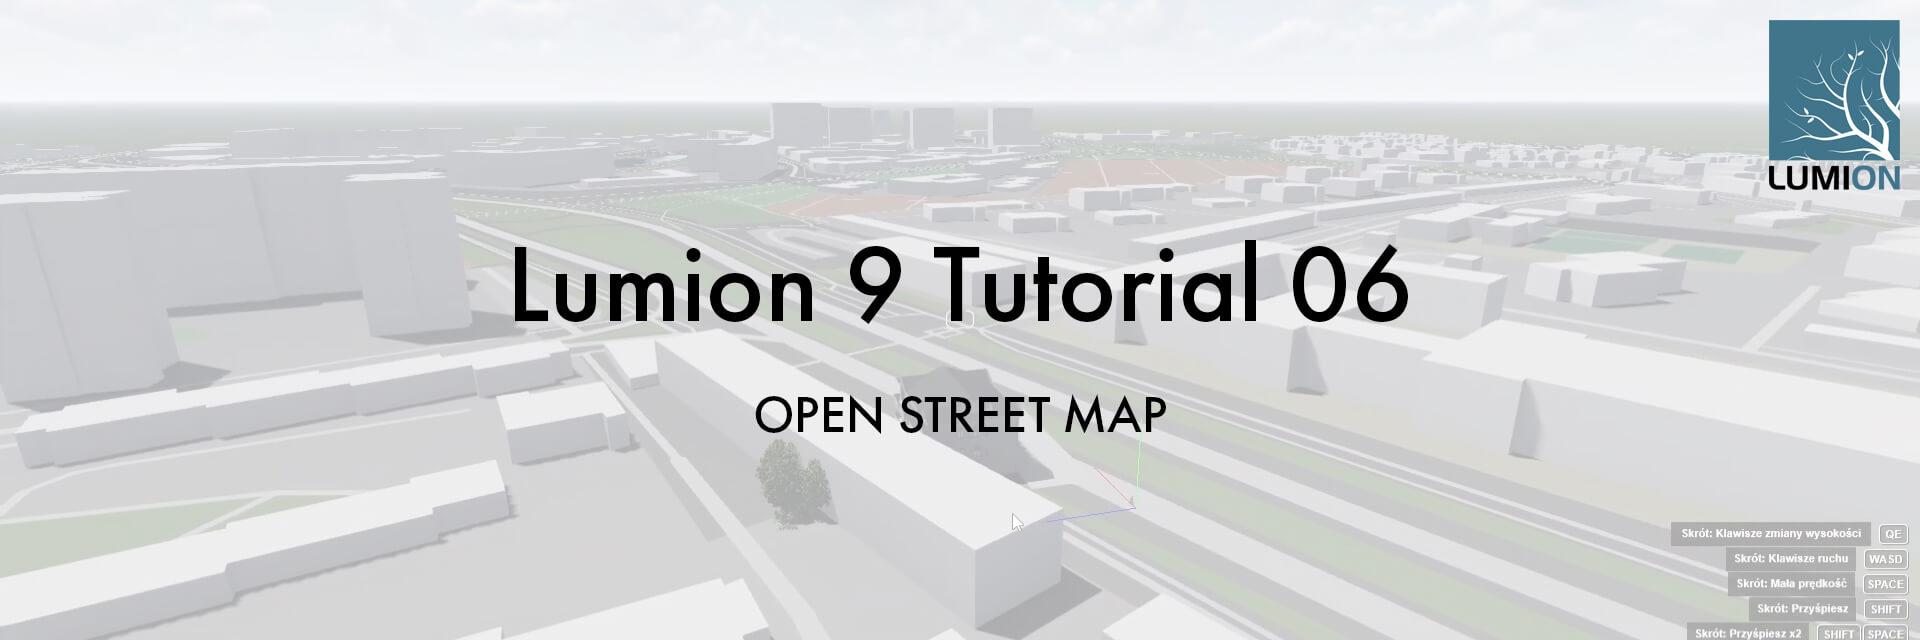 T06 ST - Lumion 9 Tutorial 06 OPEN STREET MAP